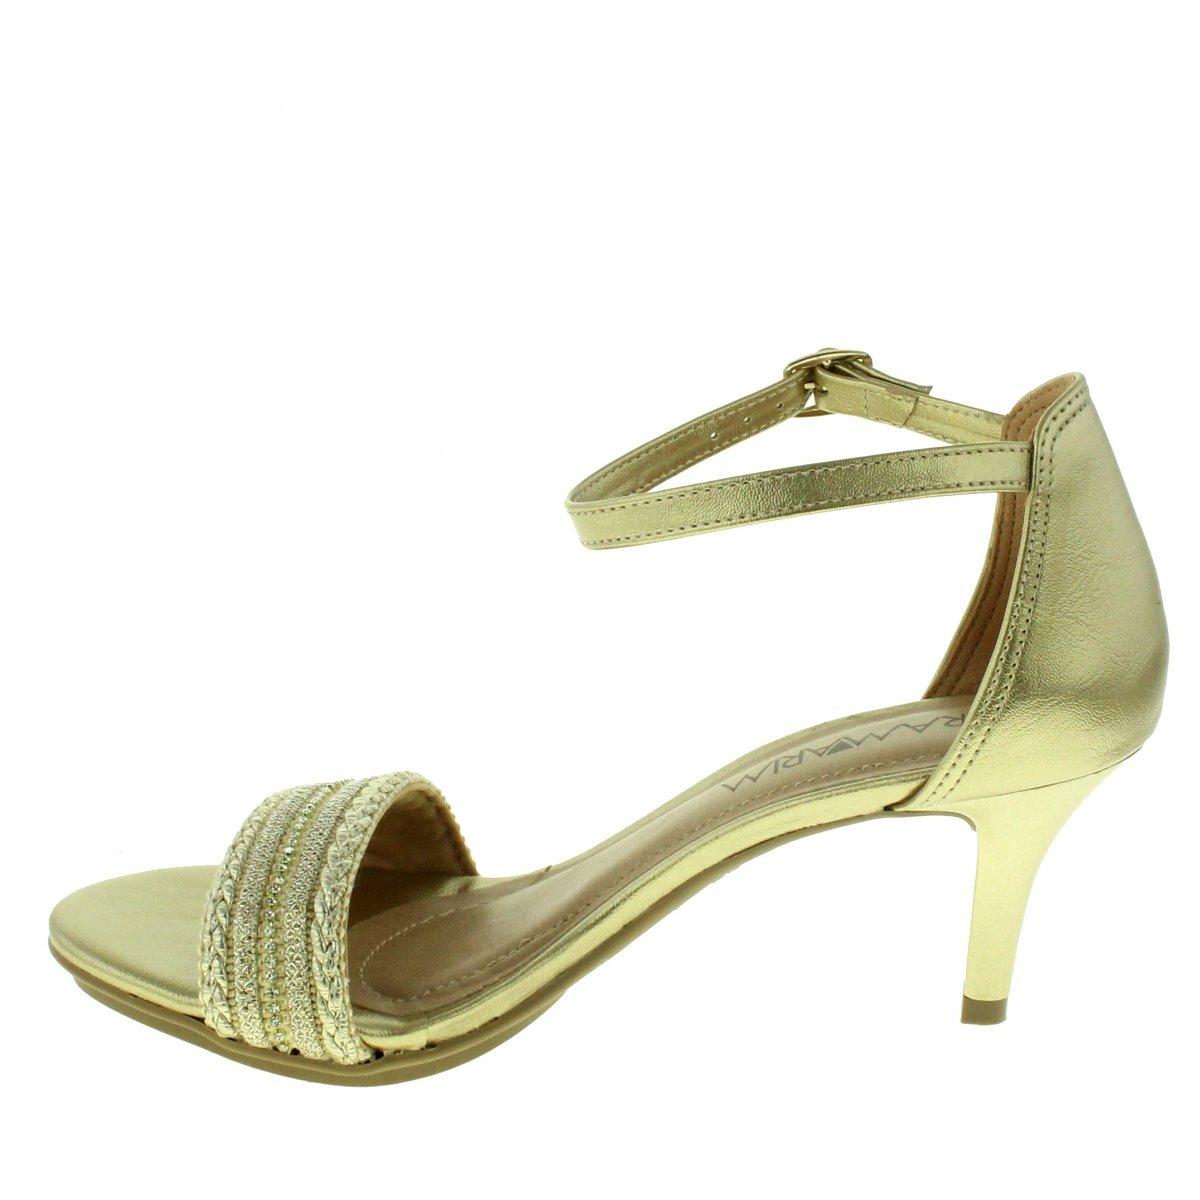 a8847cf47 Sandalia Ramarim 105-44/30p Feminina Dourada Com Salto Baixo - R ...